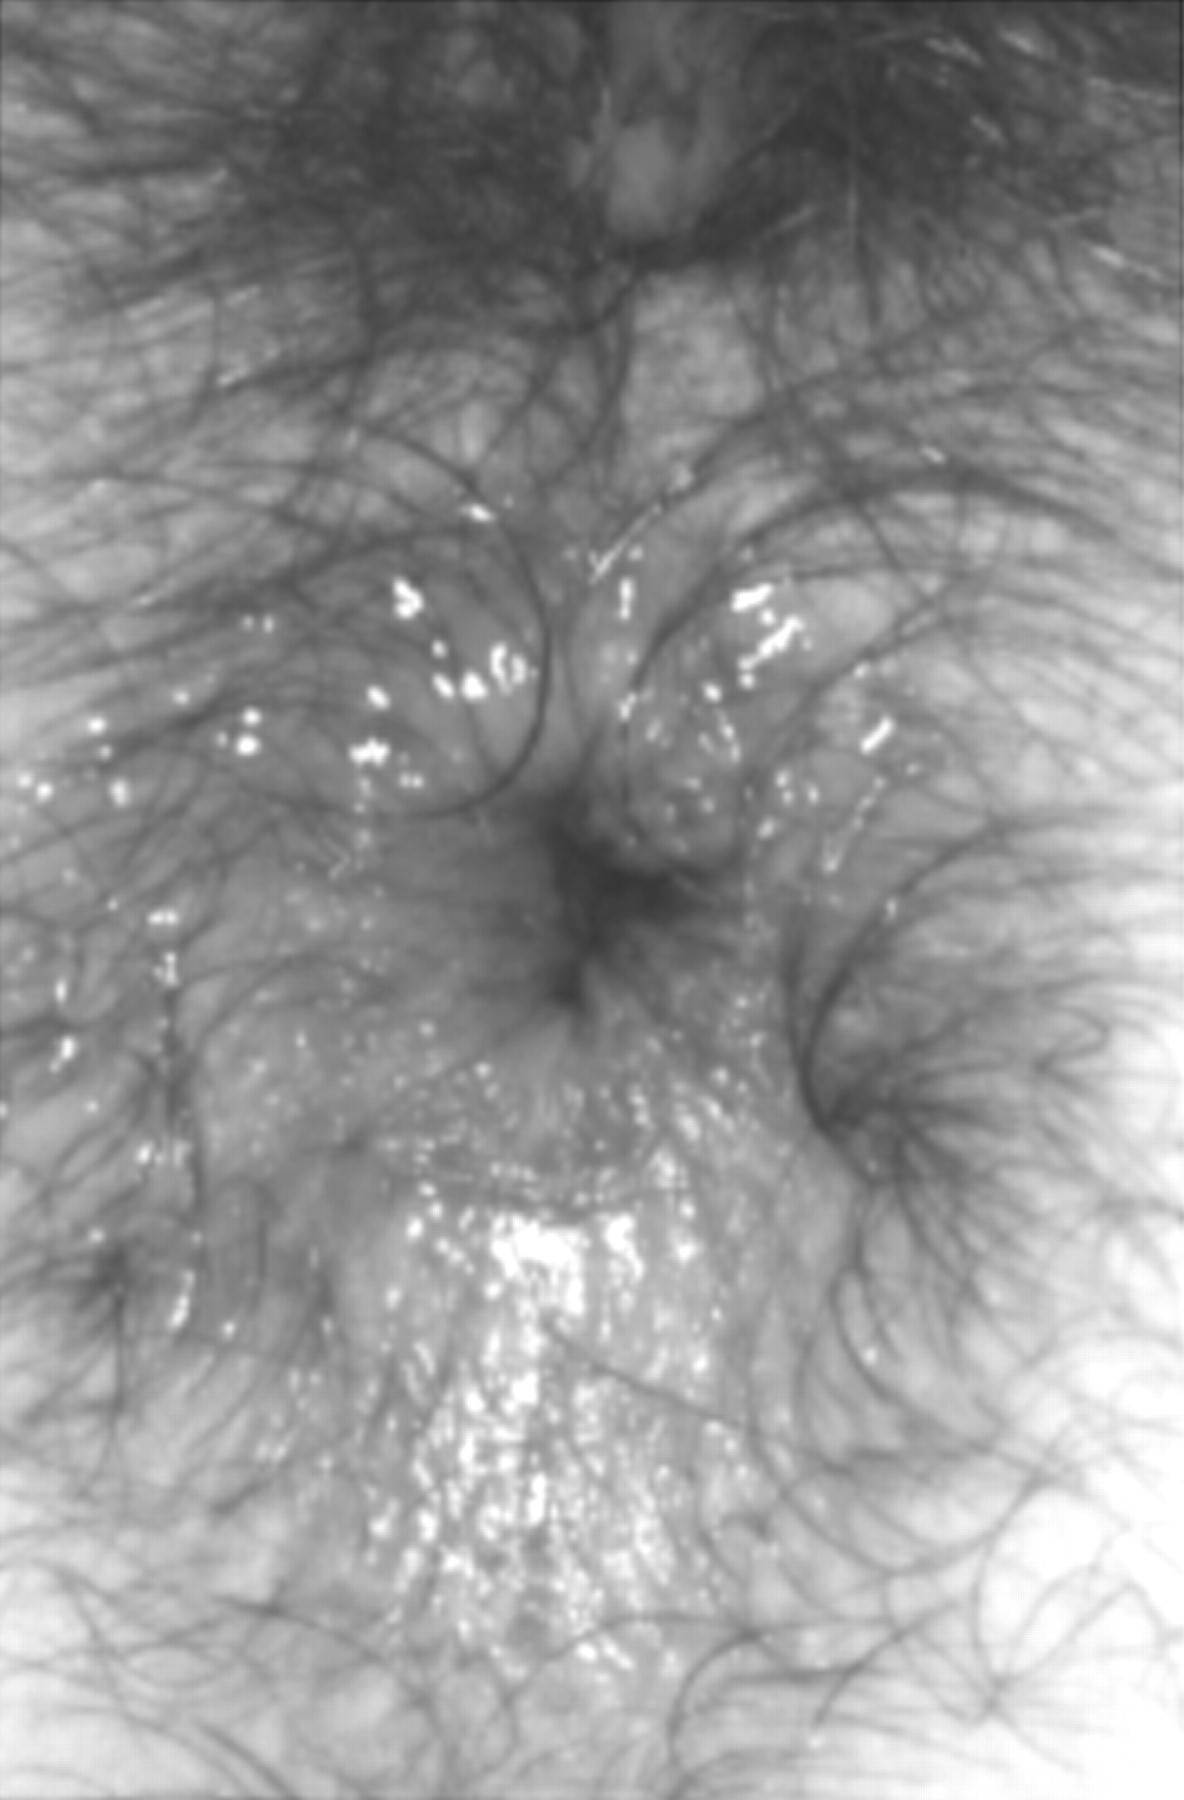 Close view of her anus